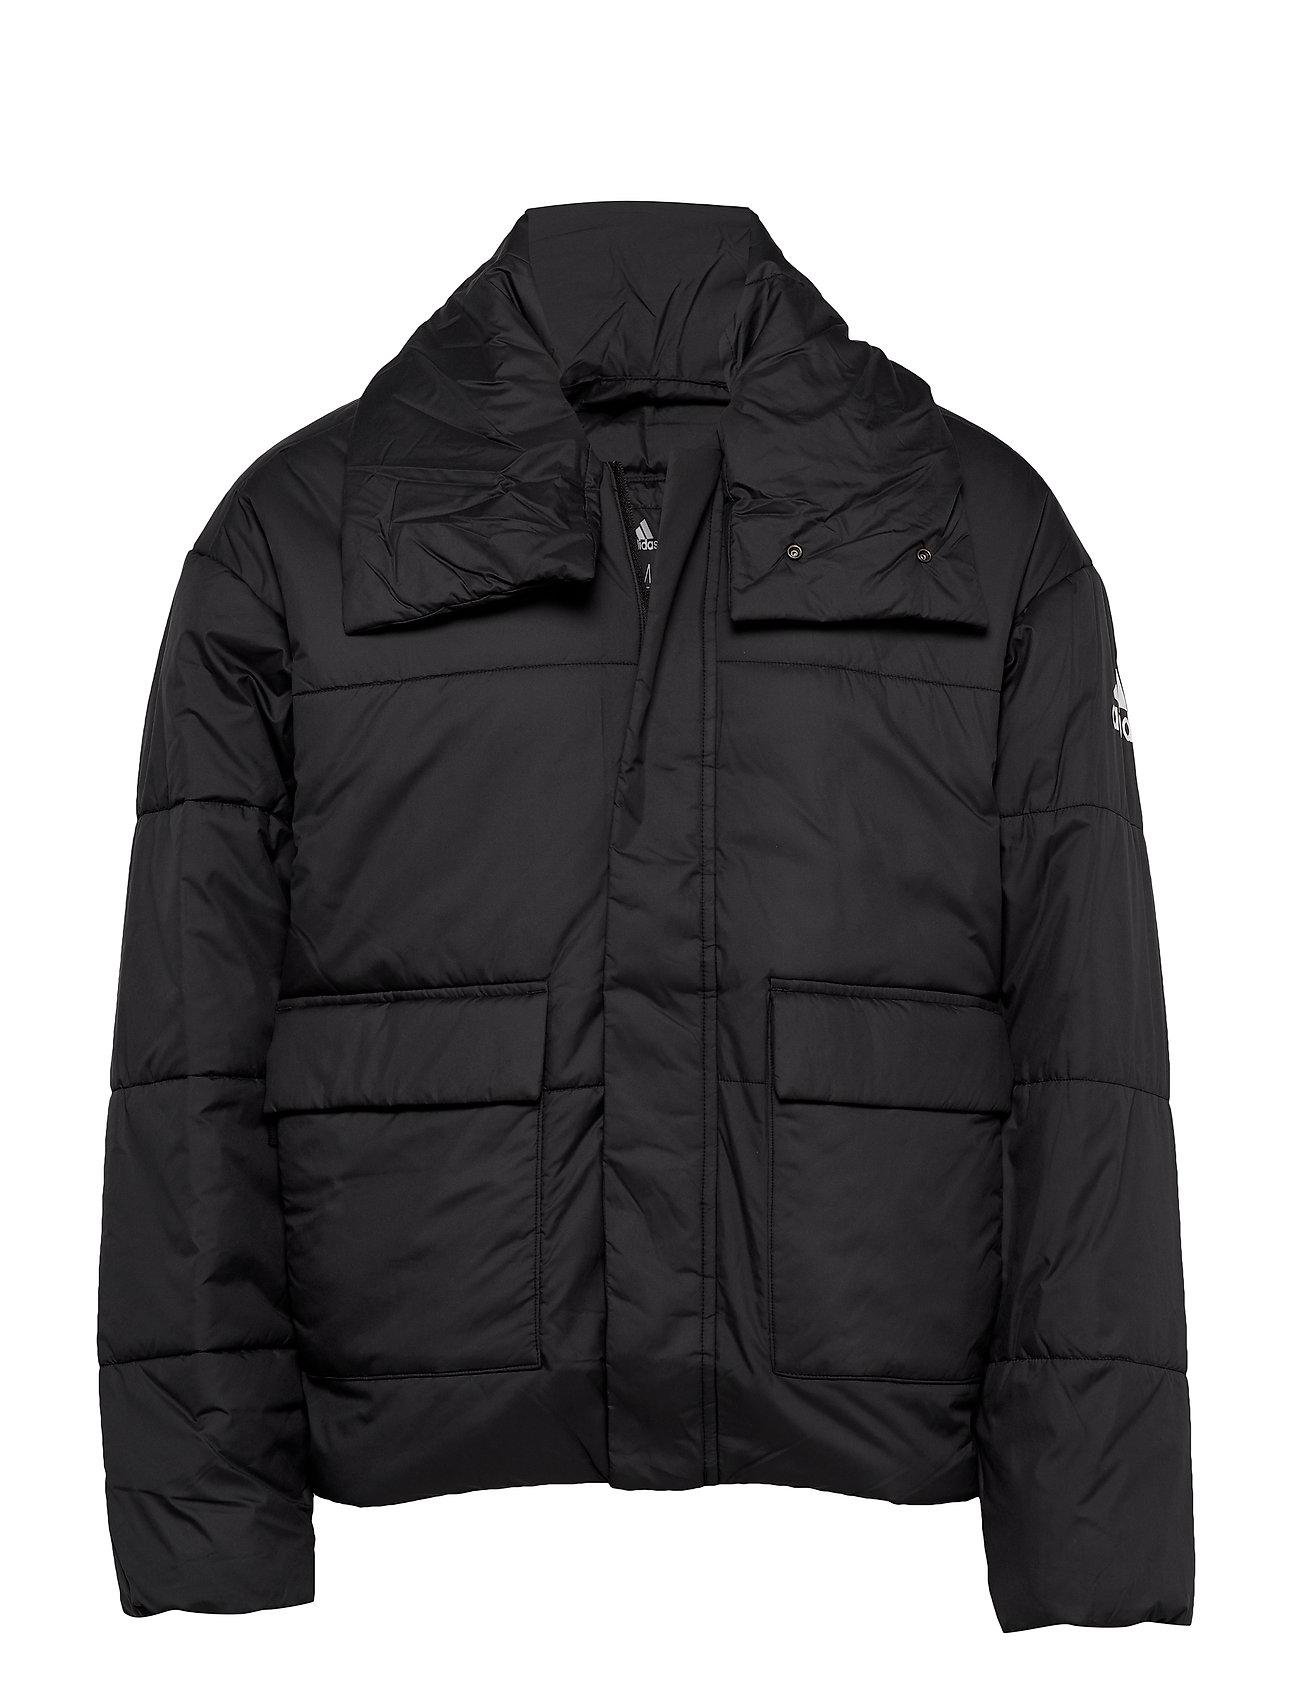 adidas Performance BIG BAFFLE JKT - BLACK